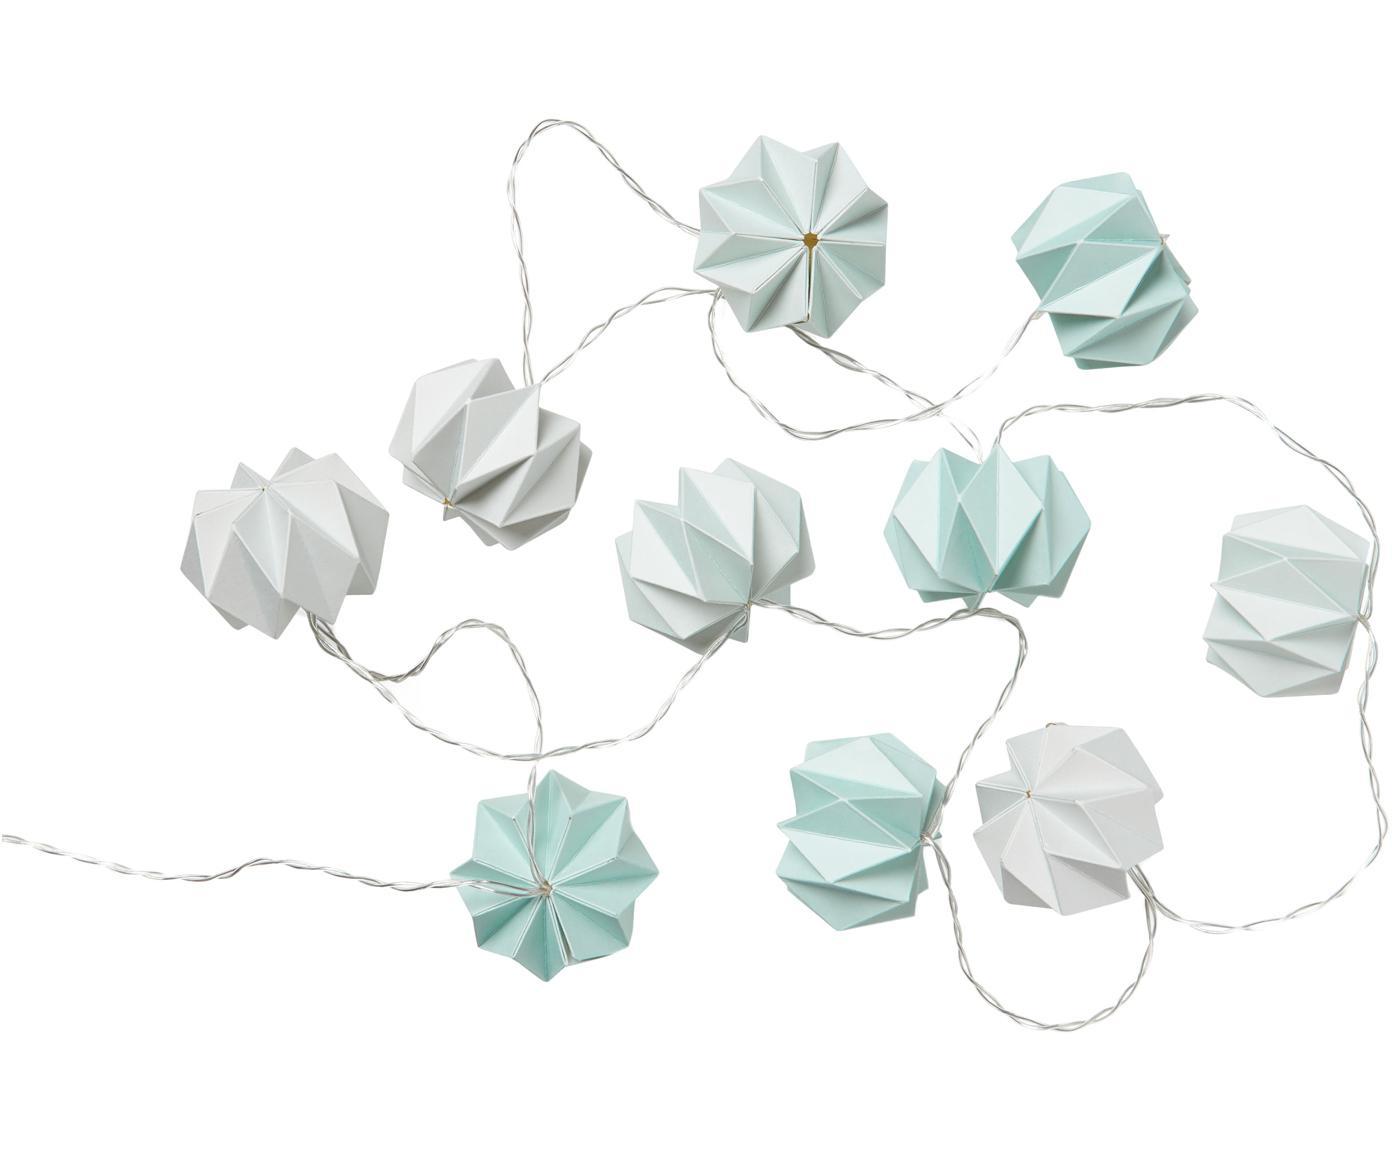 Lichterkette Origami, 200 cm, Papier, Blautöne, L 200 cm